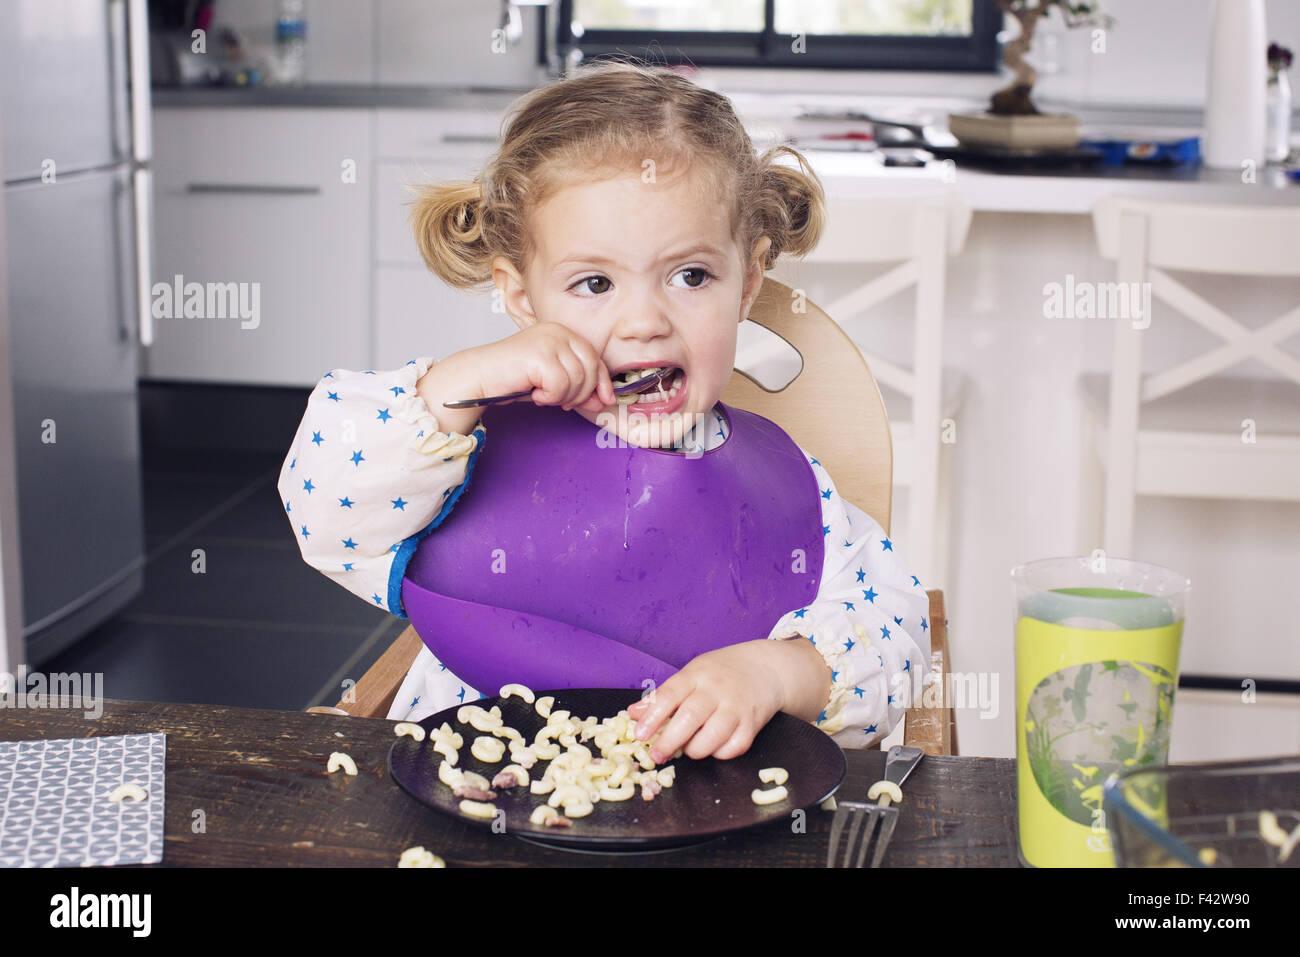 Little girl eating lunch Photo Stock